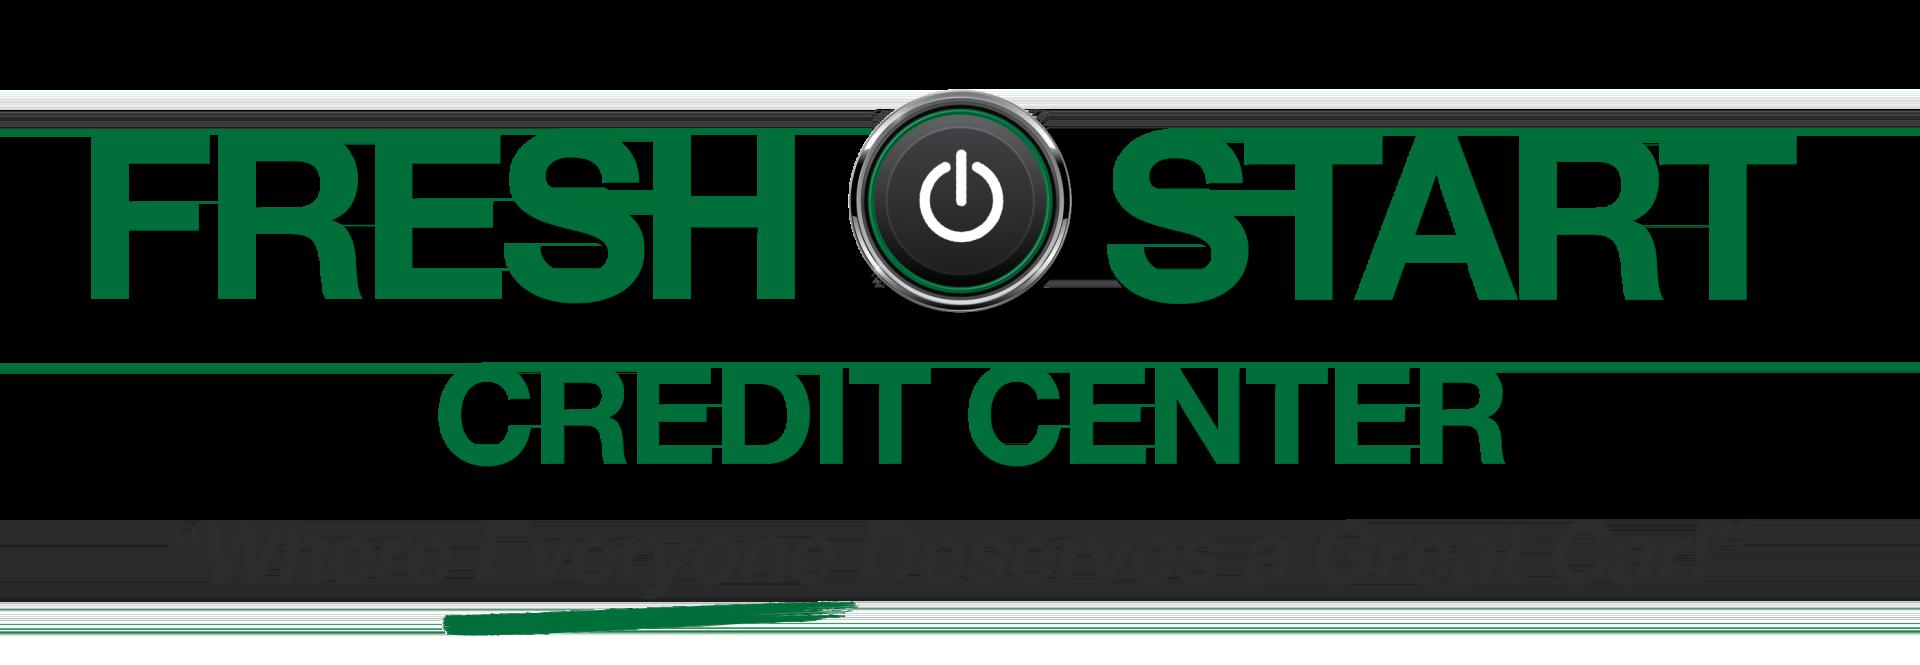 Fresh start credit center, because everyone deserves a great car!